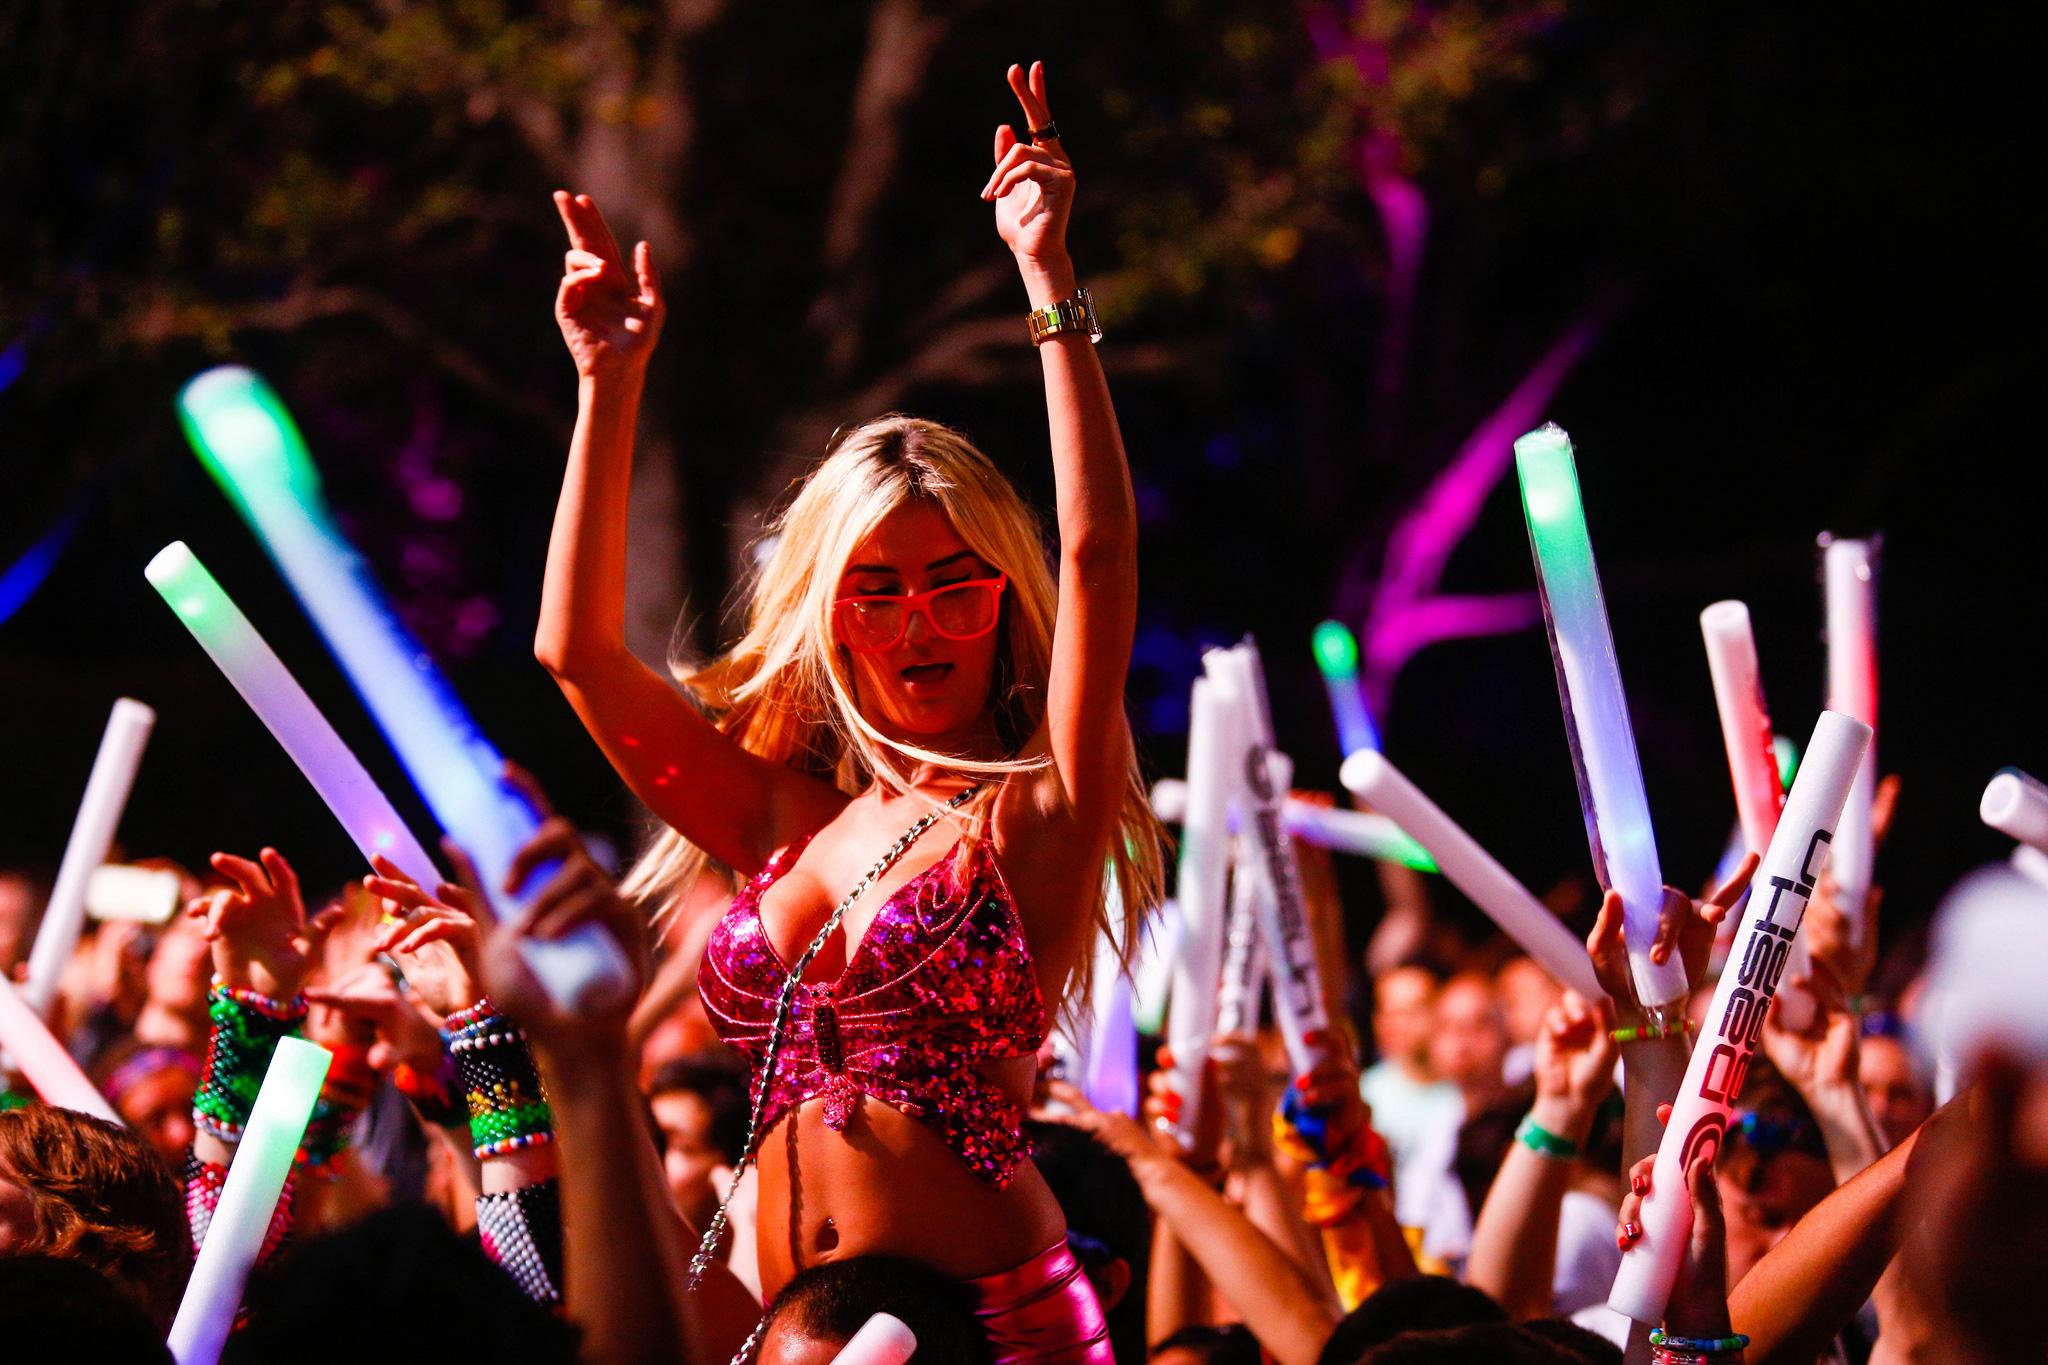 break-big-sexy-festival-girl-basu